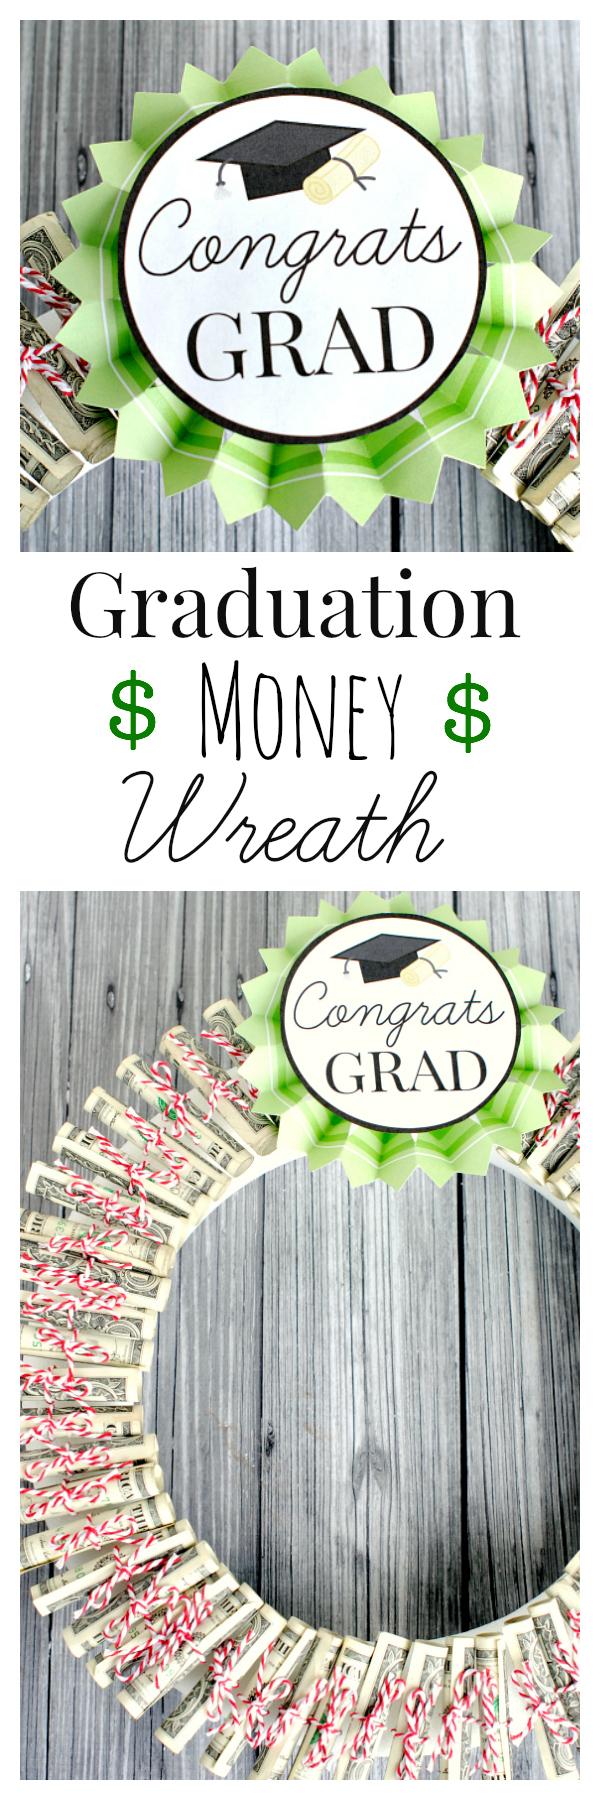 Graduation Gift Idea-Creative Way to Give Money!